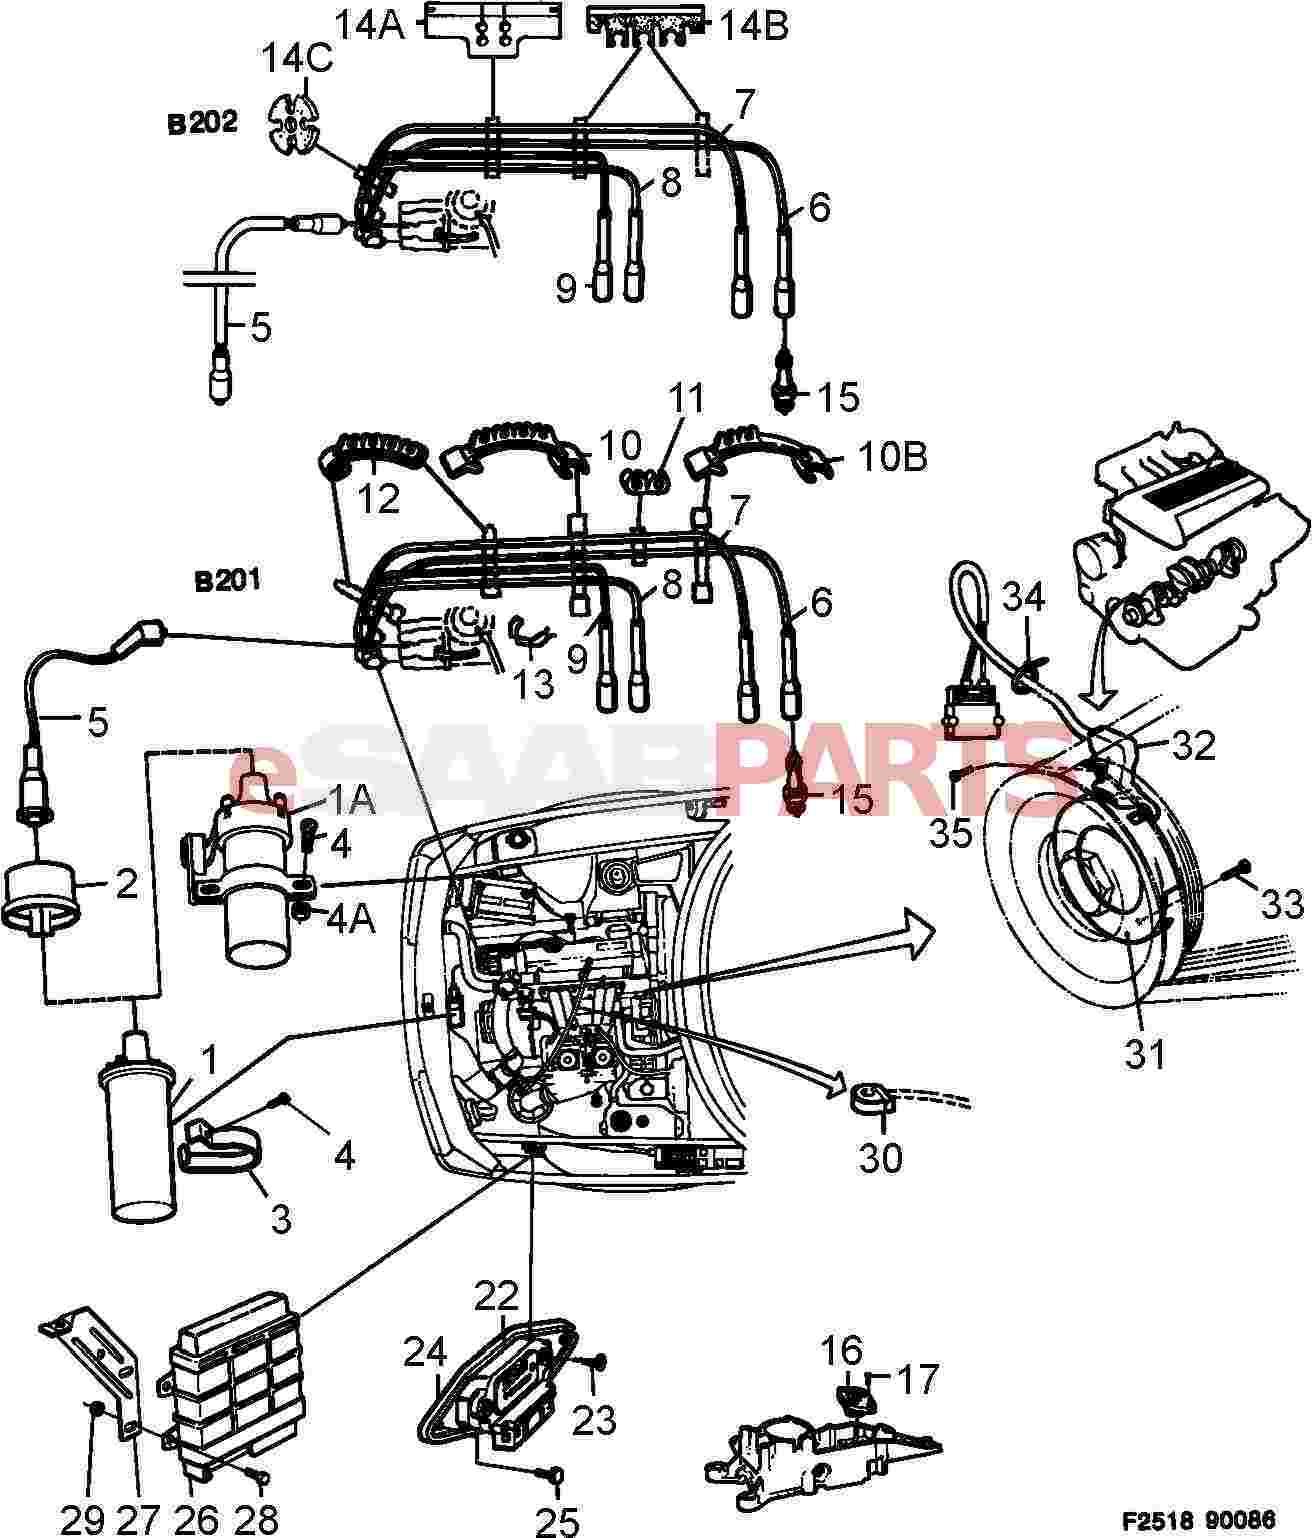 saab 900 turbo radio wiring diagram as well as saab 900 wiring diagram